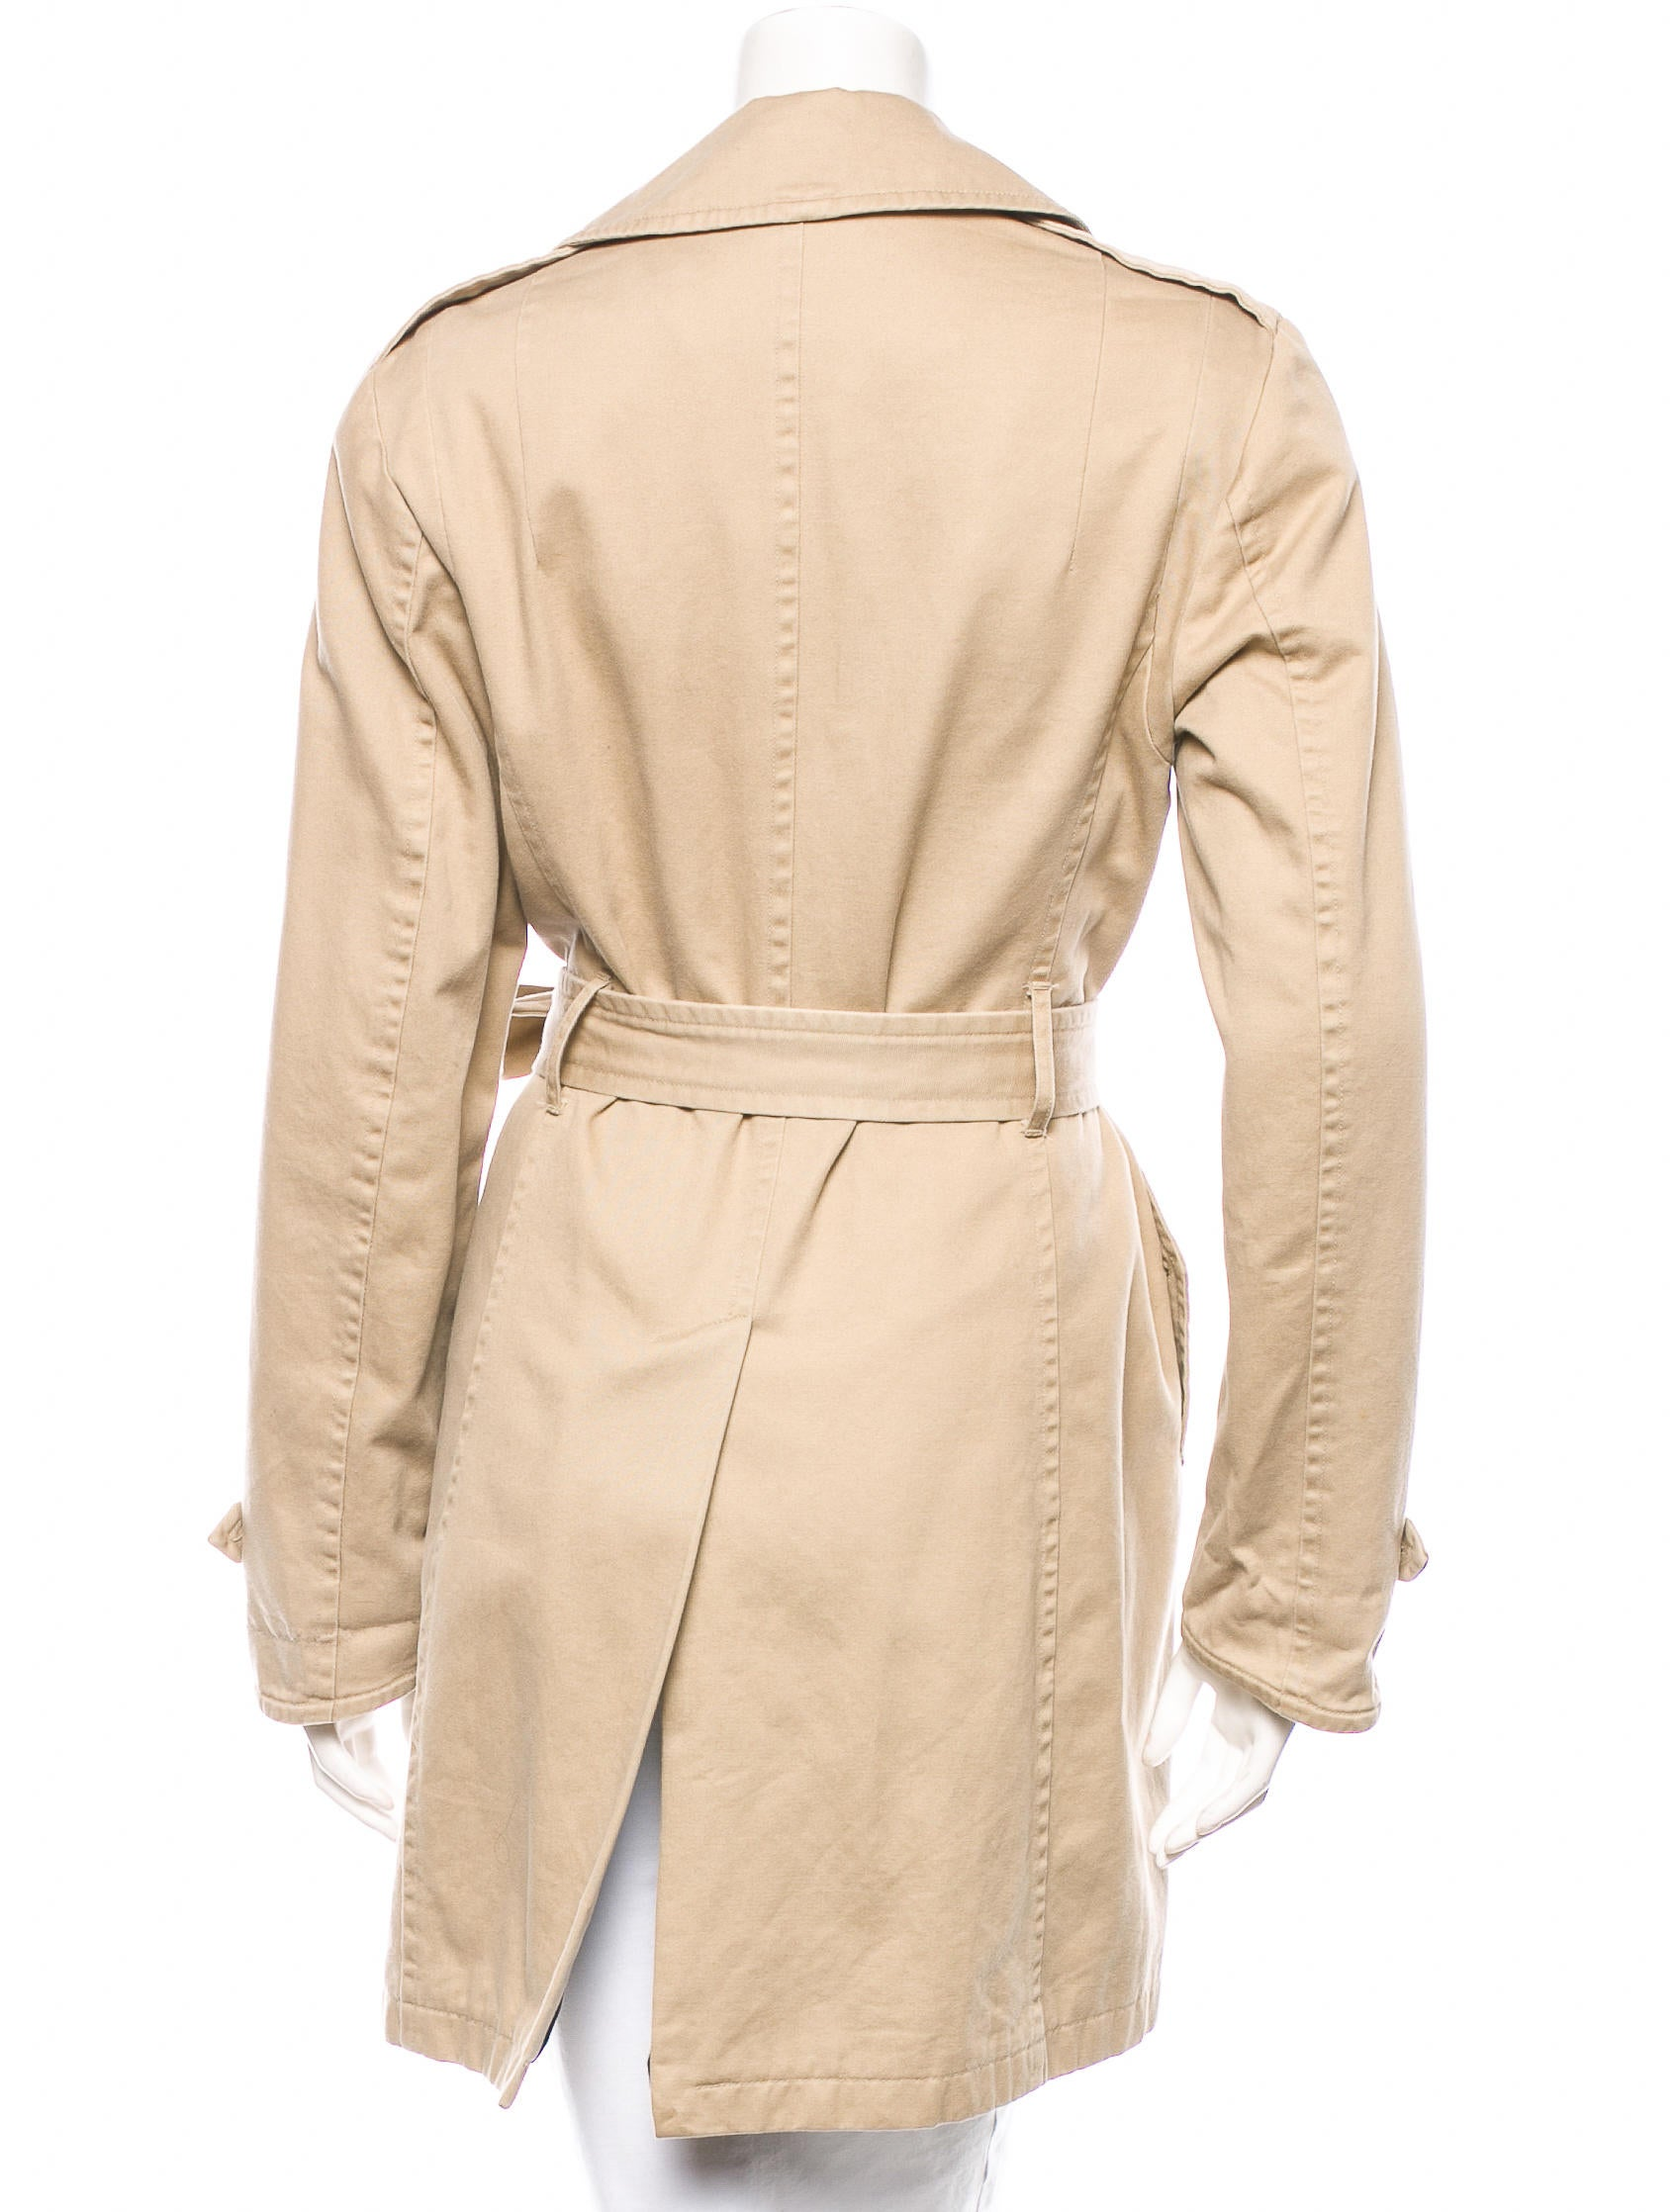 Rag & Bone Classic Trench Coat - Clothing